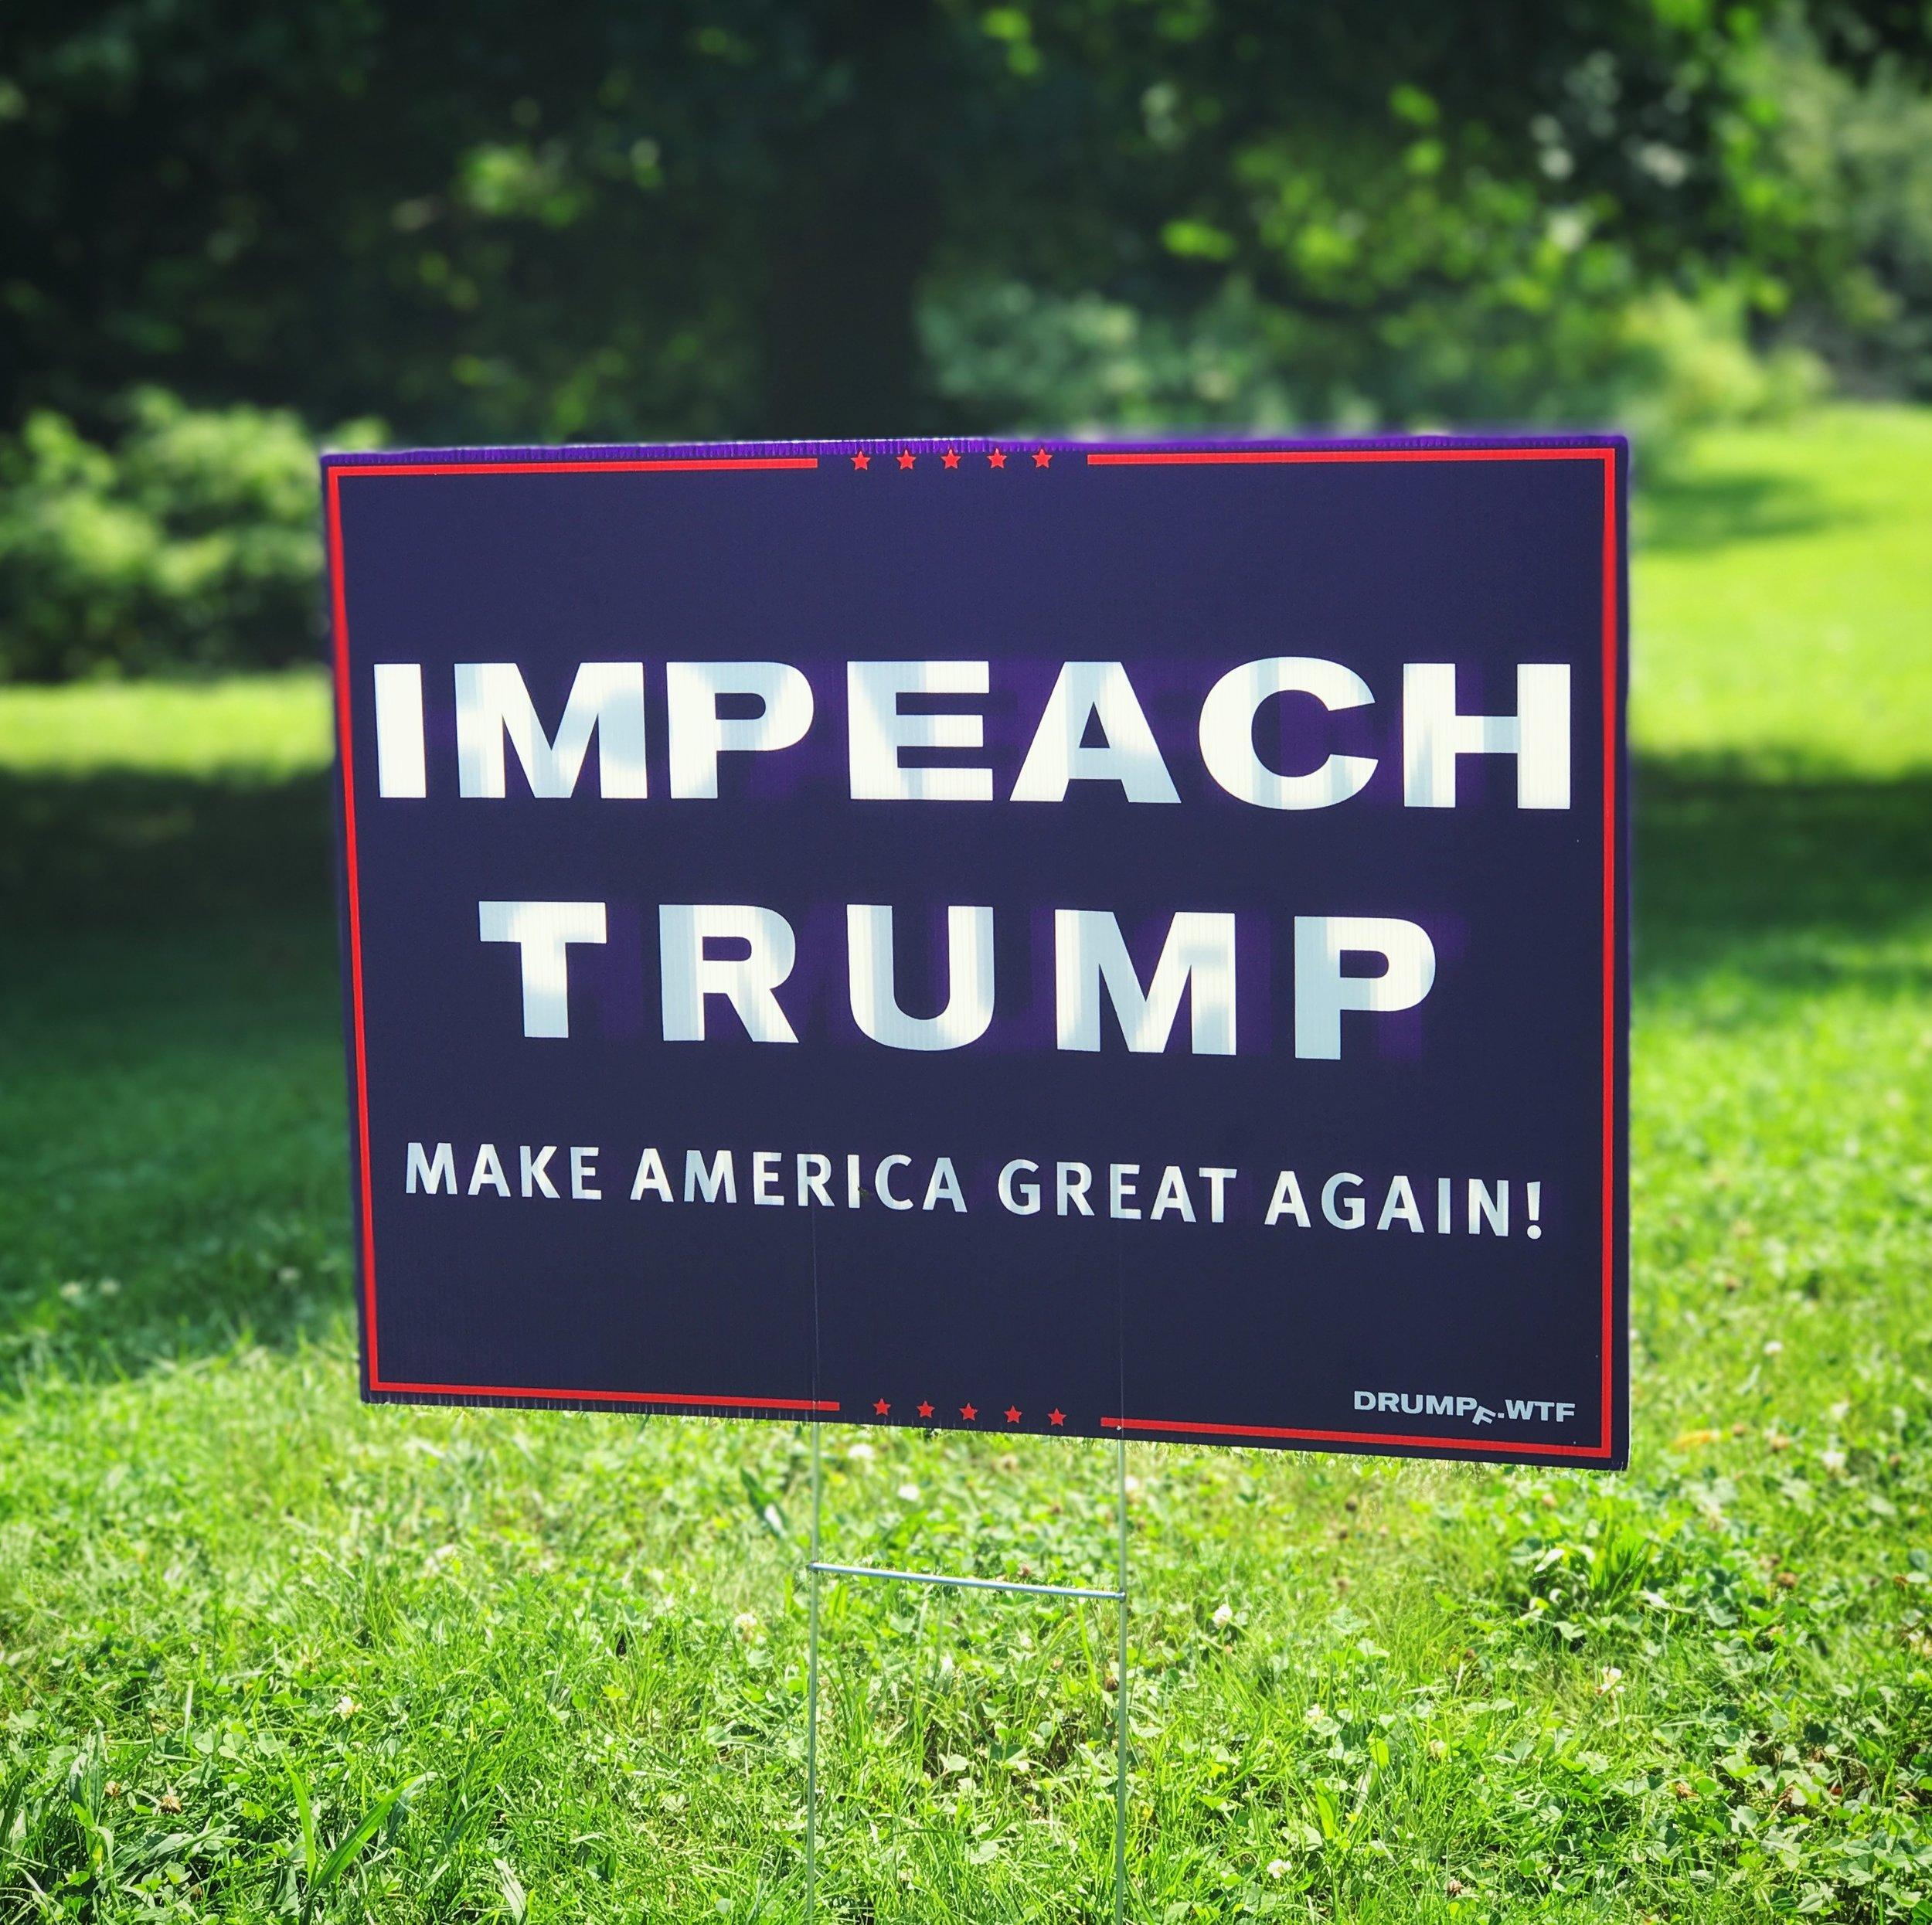 # Impeach Trump President 18x24 Yard Sign